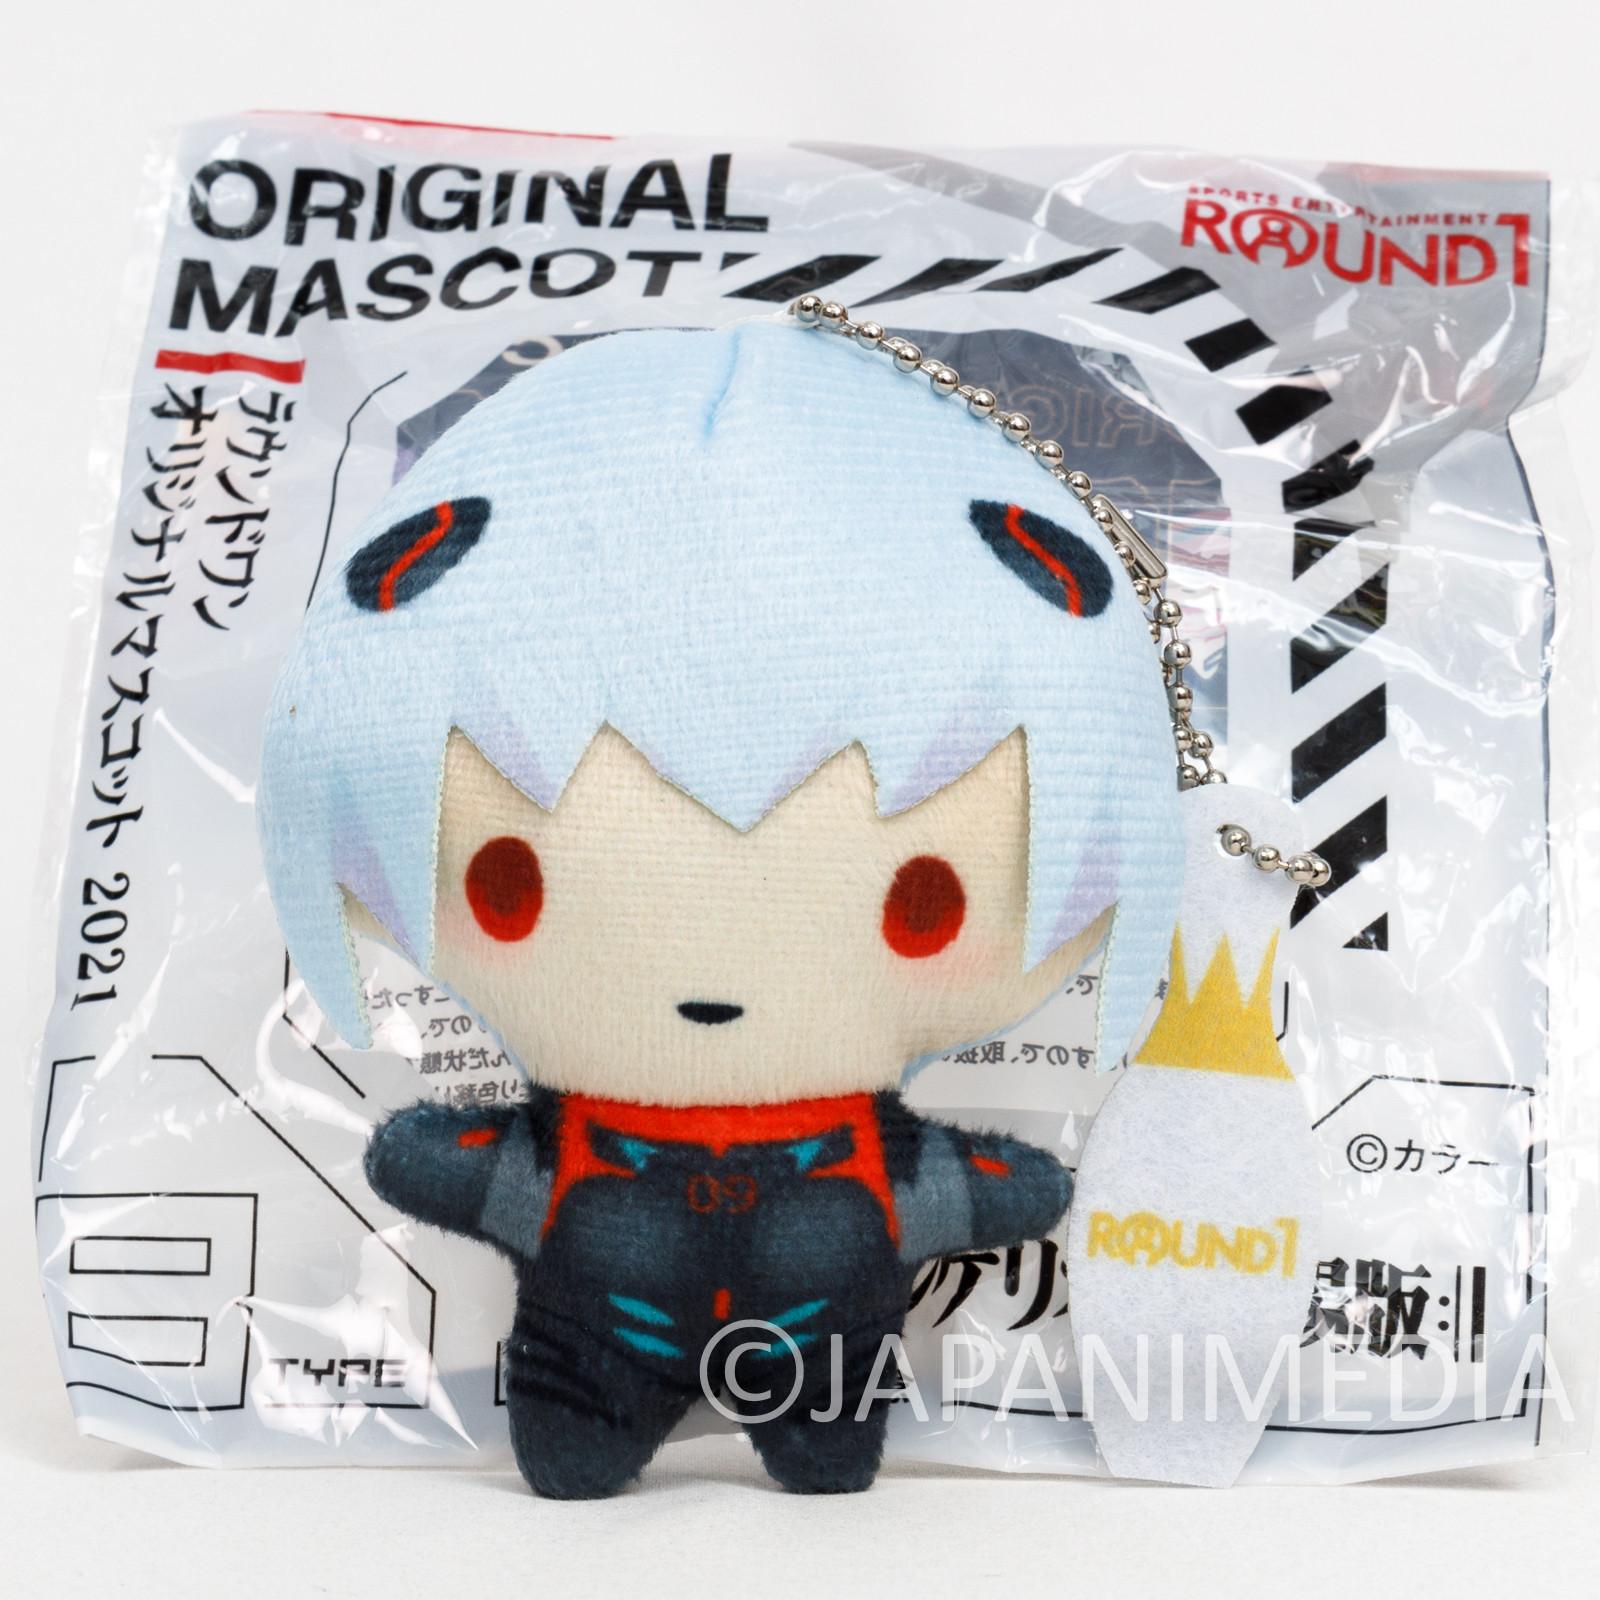 Shin Evangelion Rei Ayanami Mini Mascot Plush Doll Ballchain JAPAN